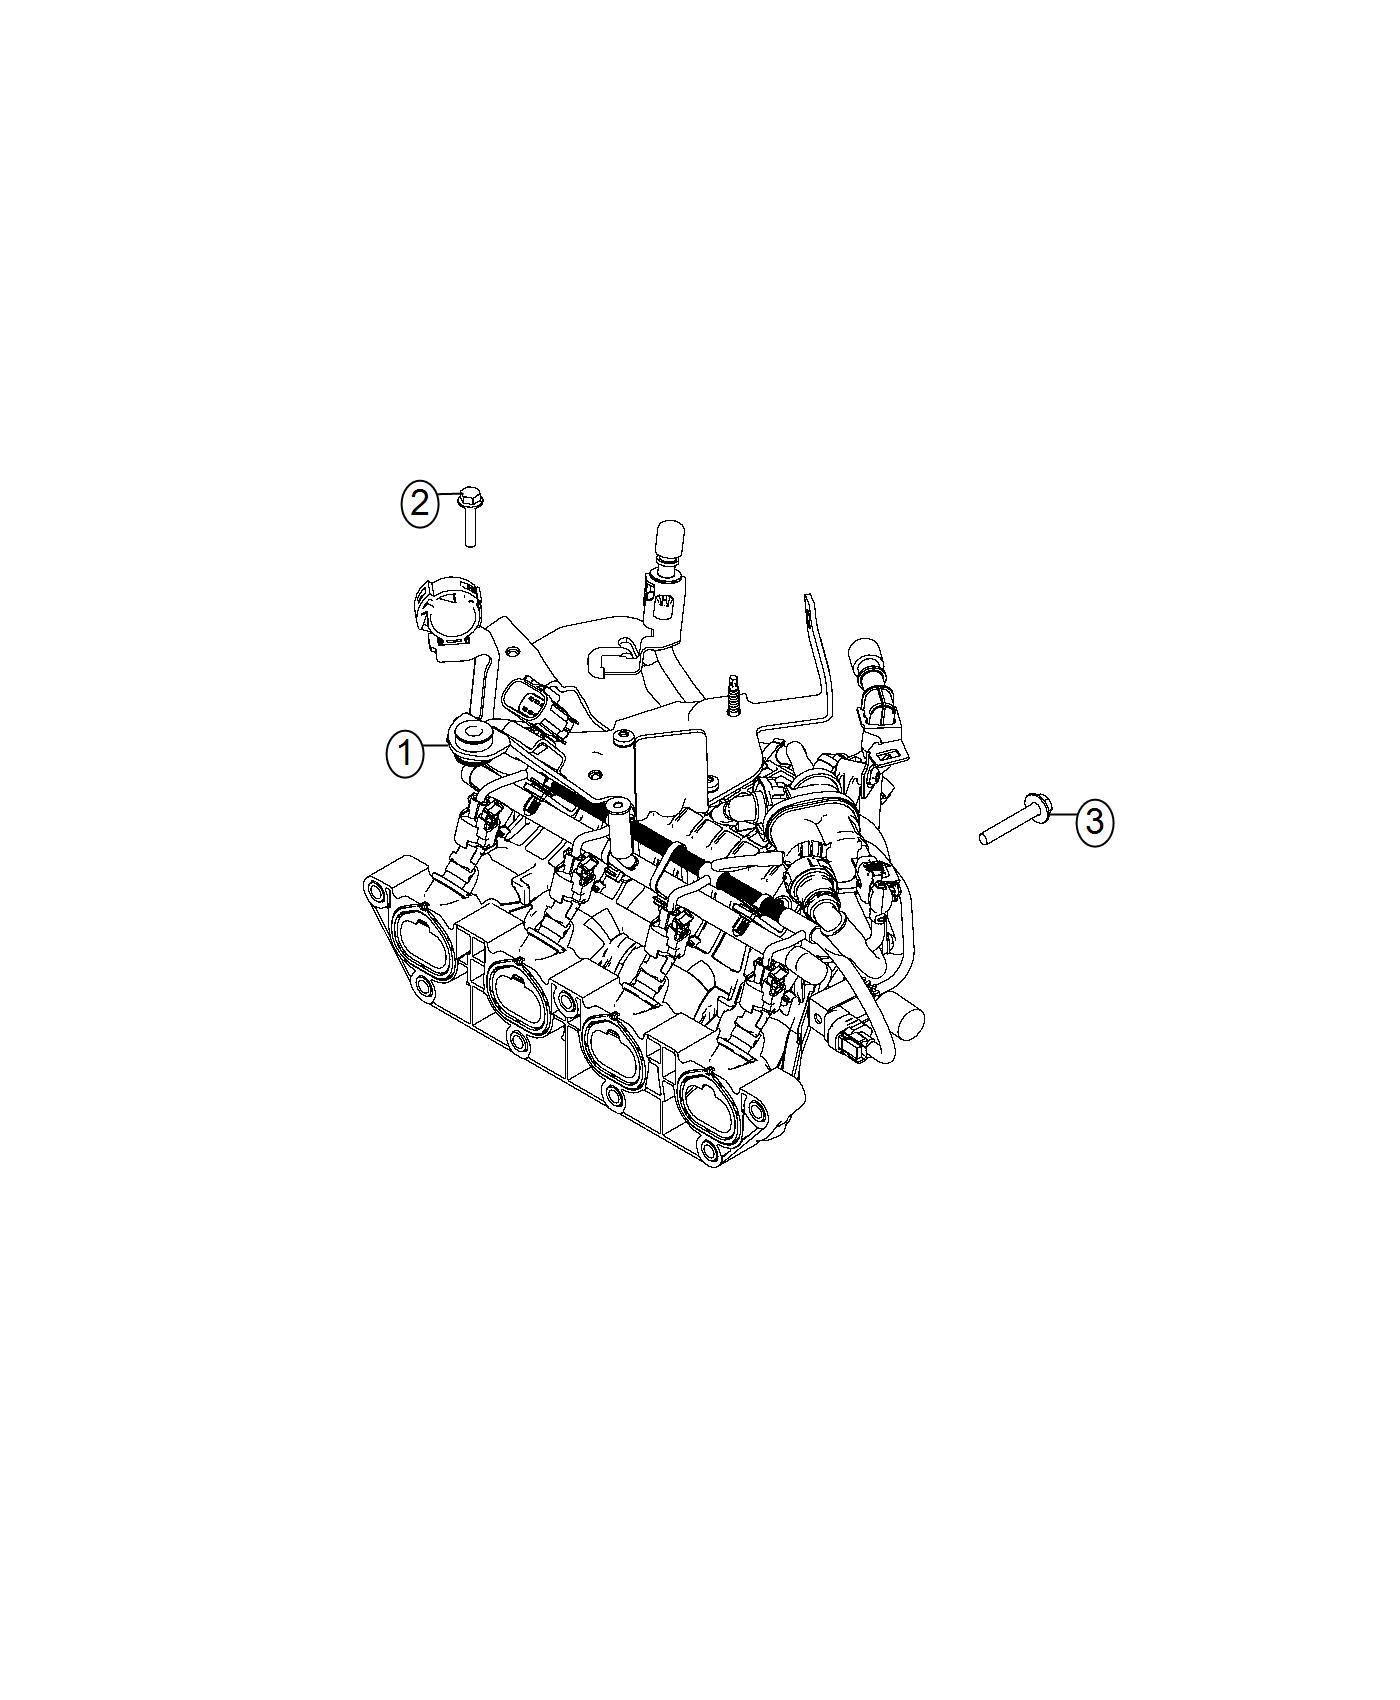 Fiat SPIDER Manifold. Engine intake, intake. Wiring, fuel